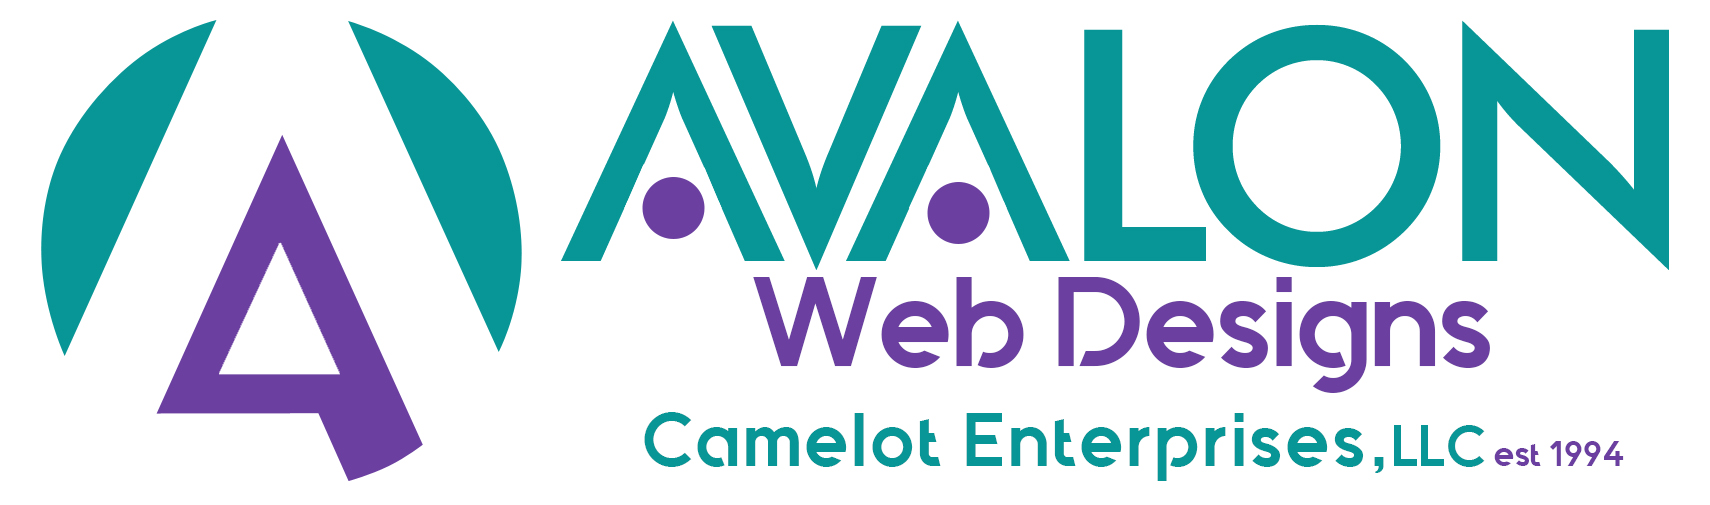 Avalon Web Designs | Professionally designed responsive websites. ~ AvalonWebDesigns.com